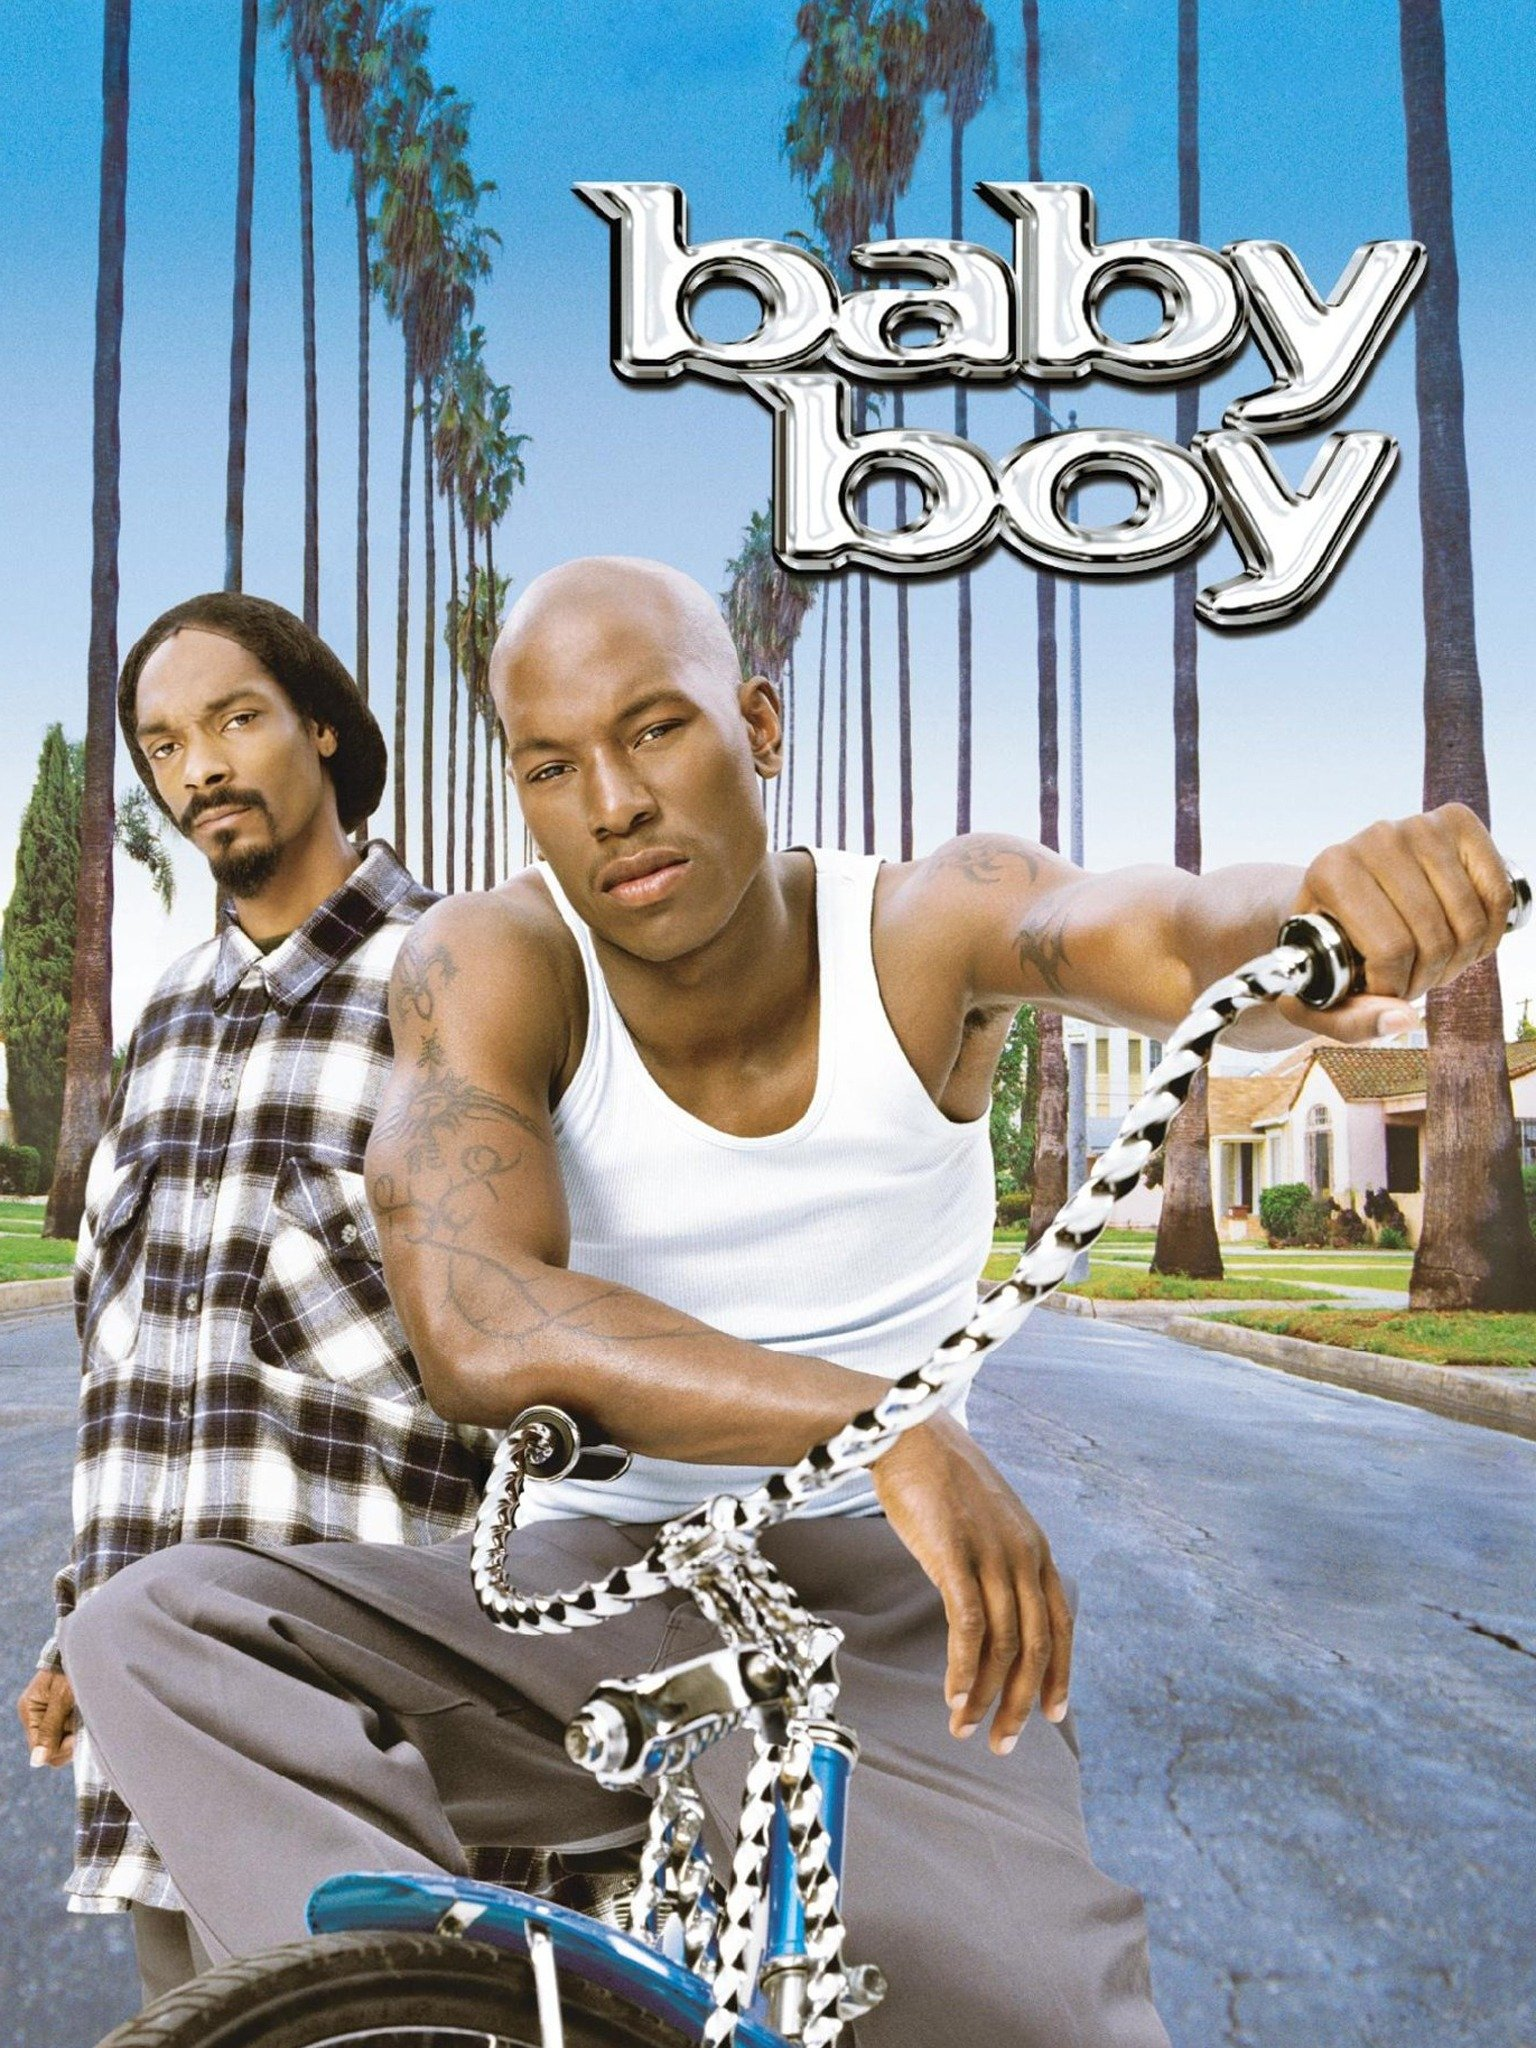 Baby Boy - Full Cast & Crew - TV Guide